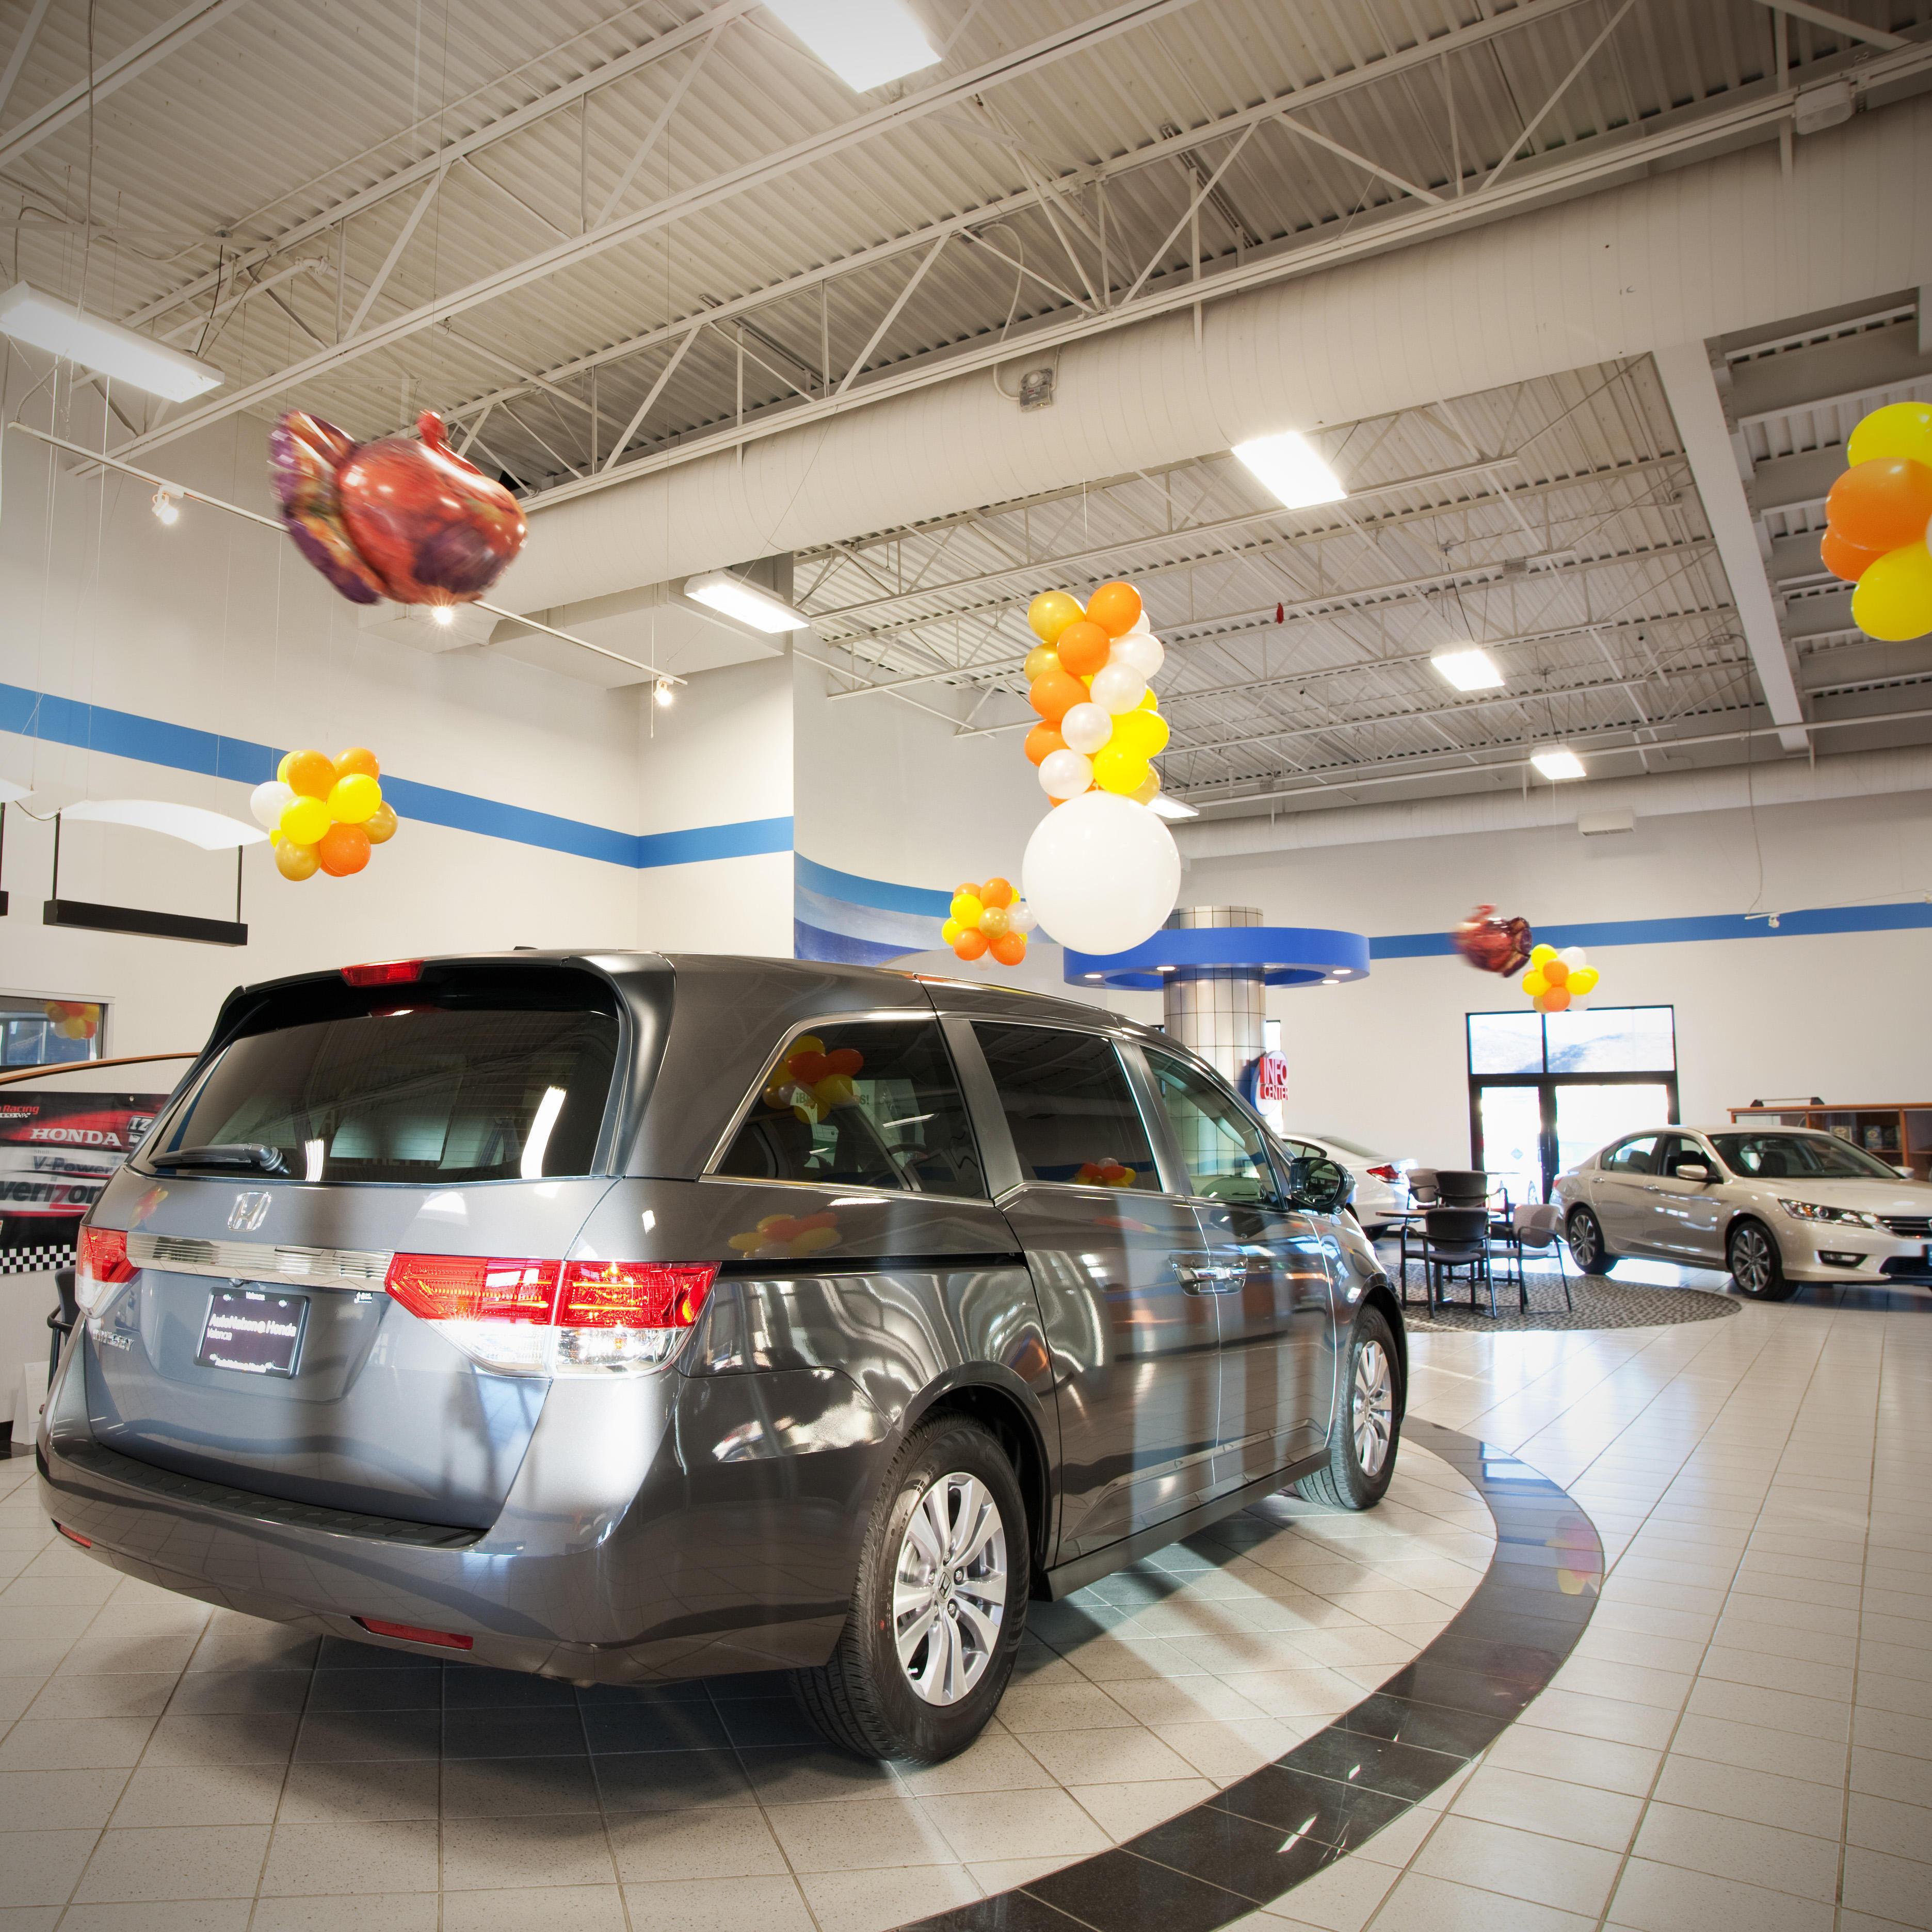 Valley honda dealers honda cars trucks suvs hybrids for Valley honda dealers